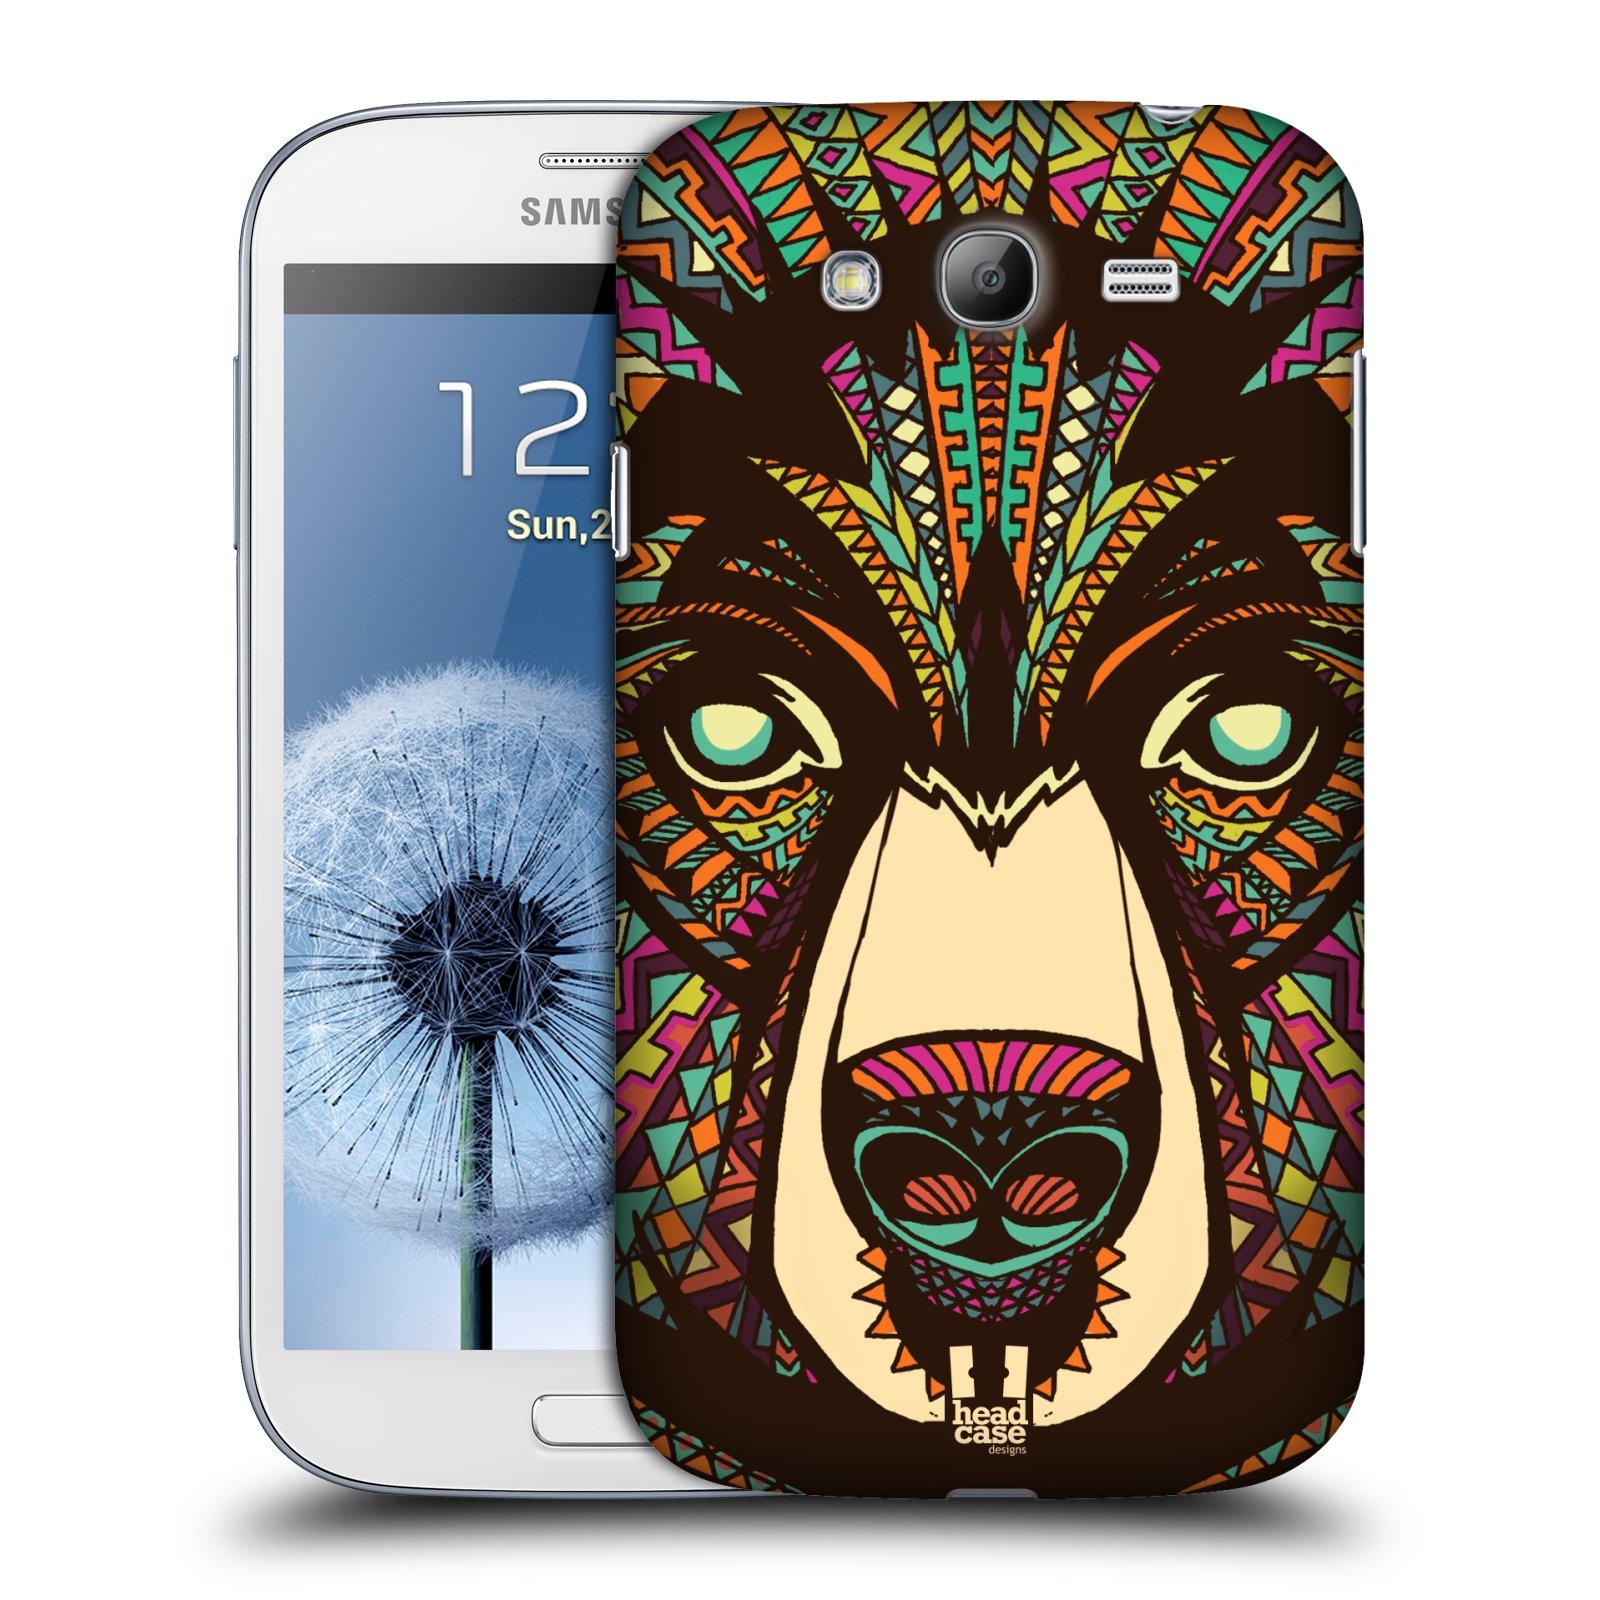 Plastové pouzdro na mobil Samsung Galaxy Grand Neo Plus HEAD CASE AZTEC MEDVĚD (Kryt či obal na mobilní telefon Samsung Galaxy Grand Neo Plus GT-i9060i)